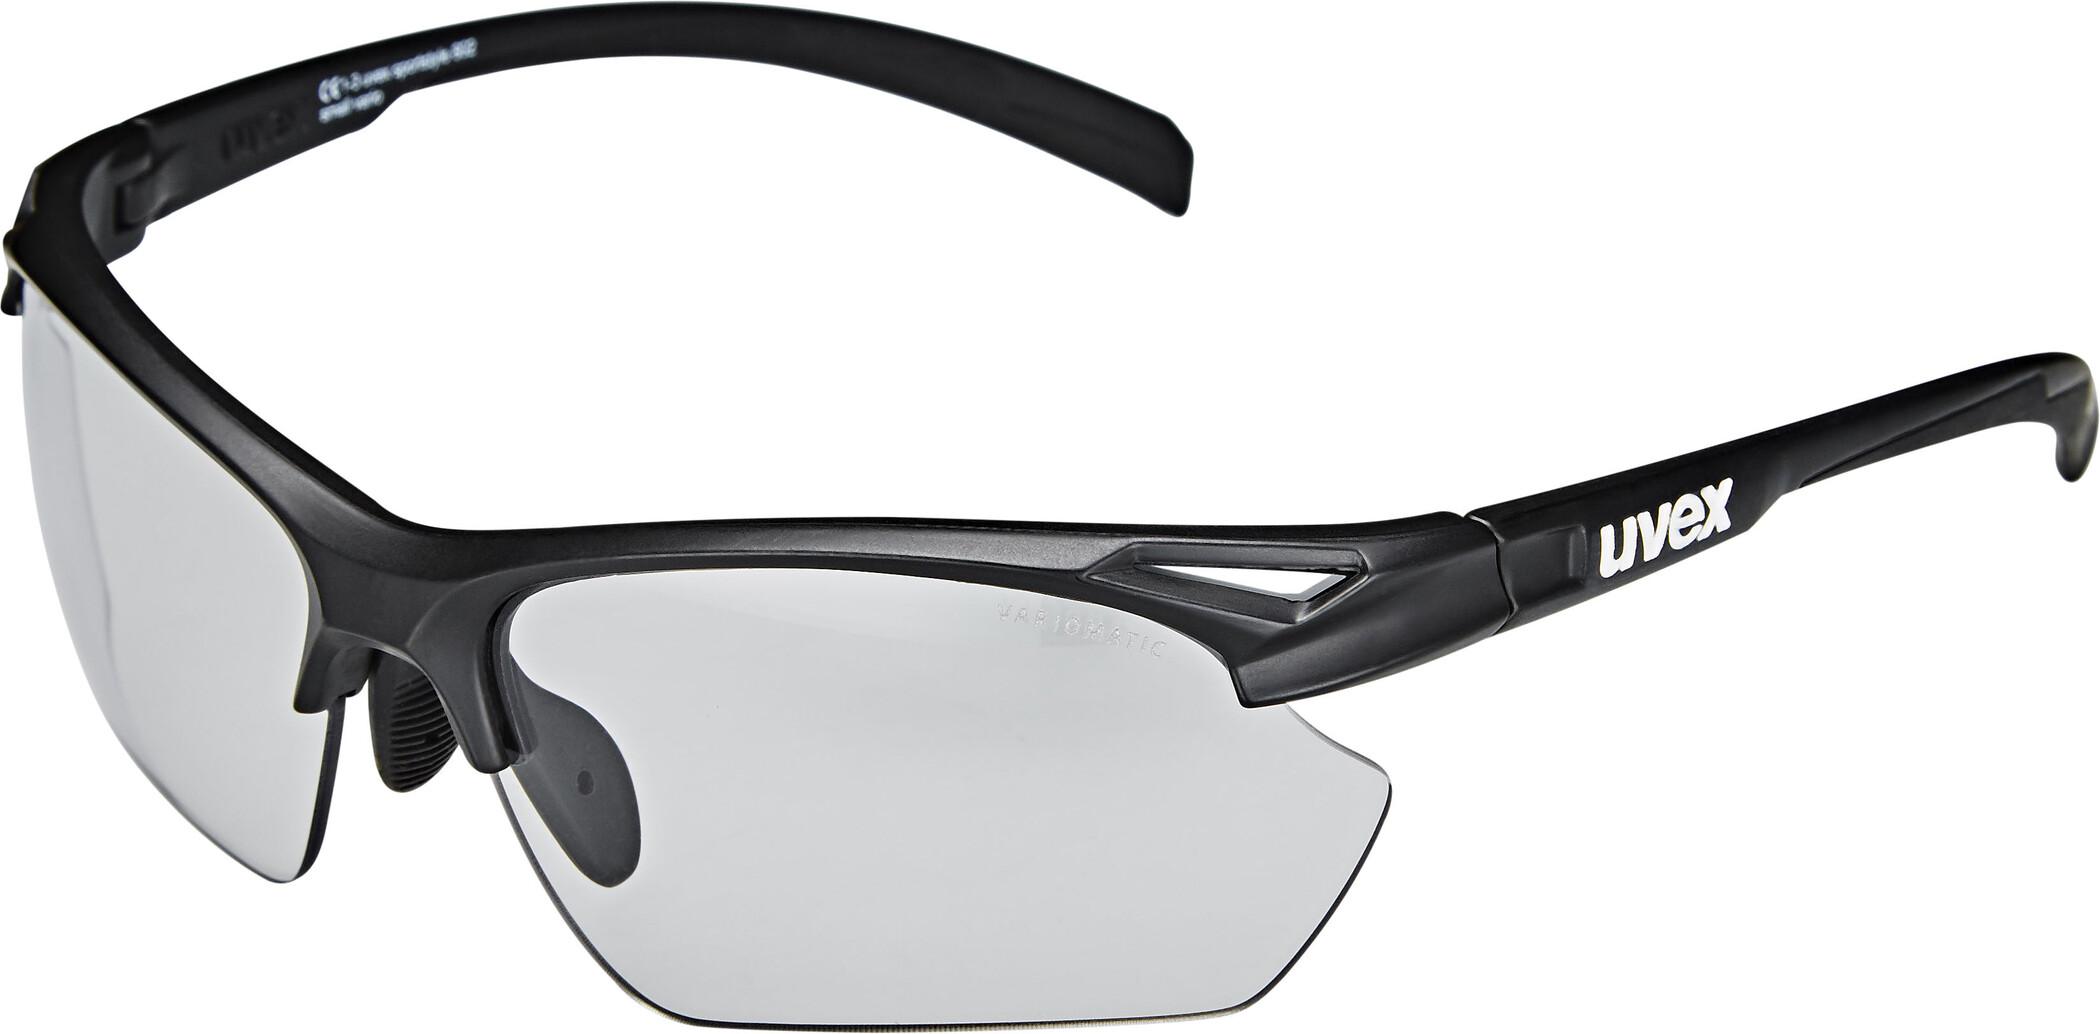 UVEX Sportstyle 802 V Sportsbriller Small Damer, black mat/smoke (2020) | Glasses